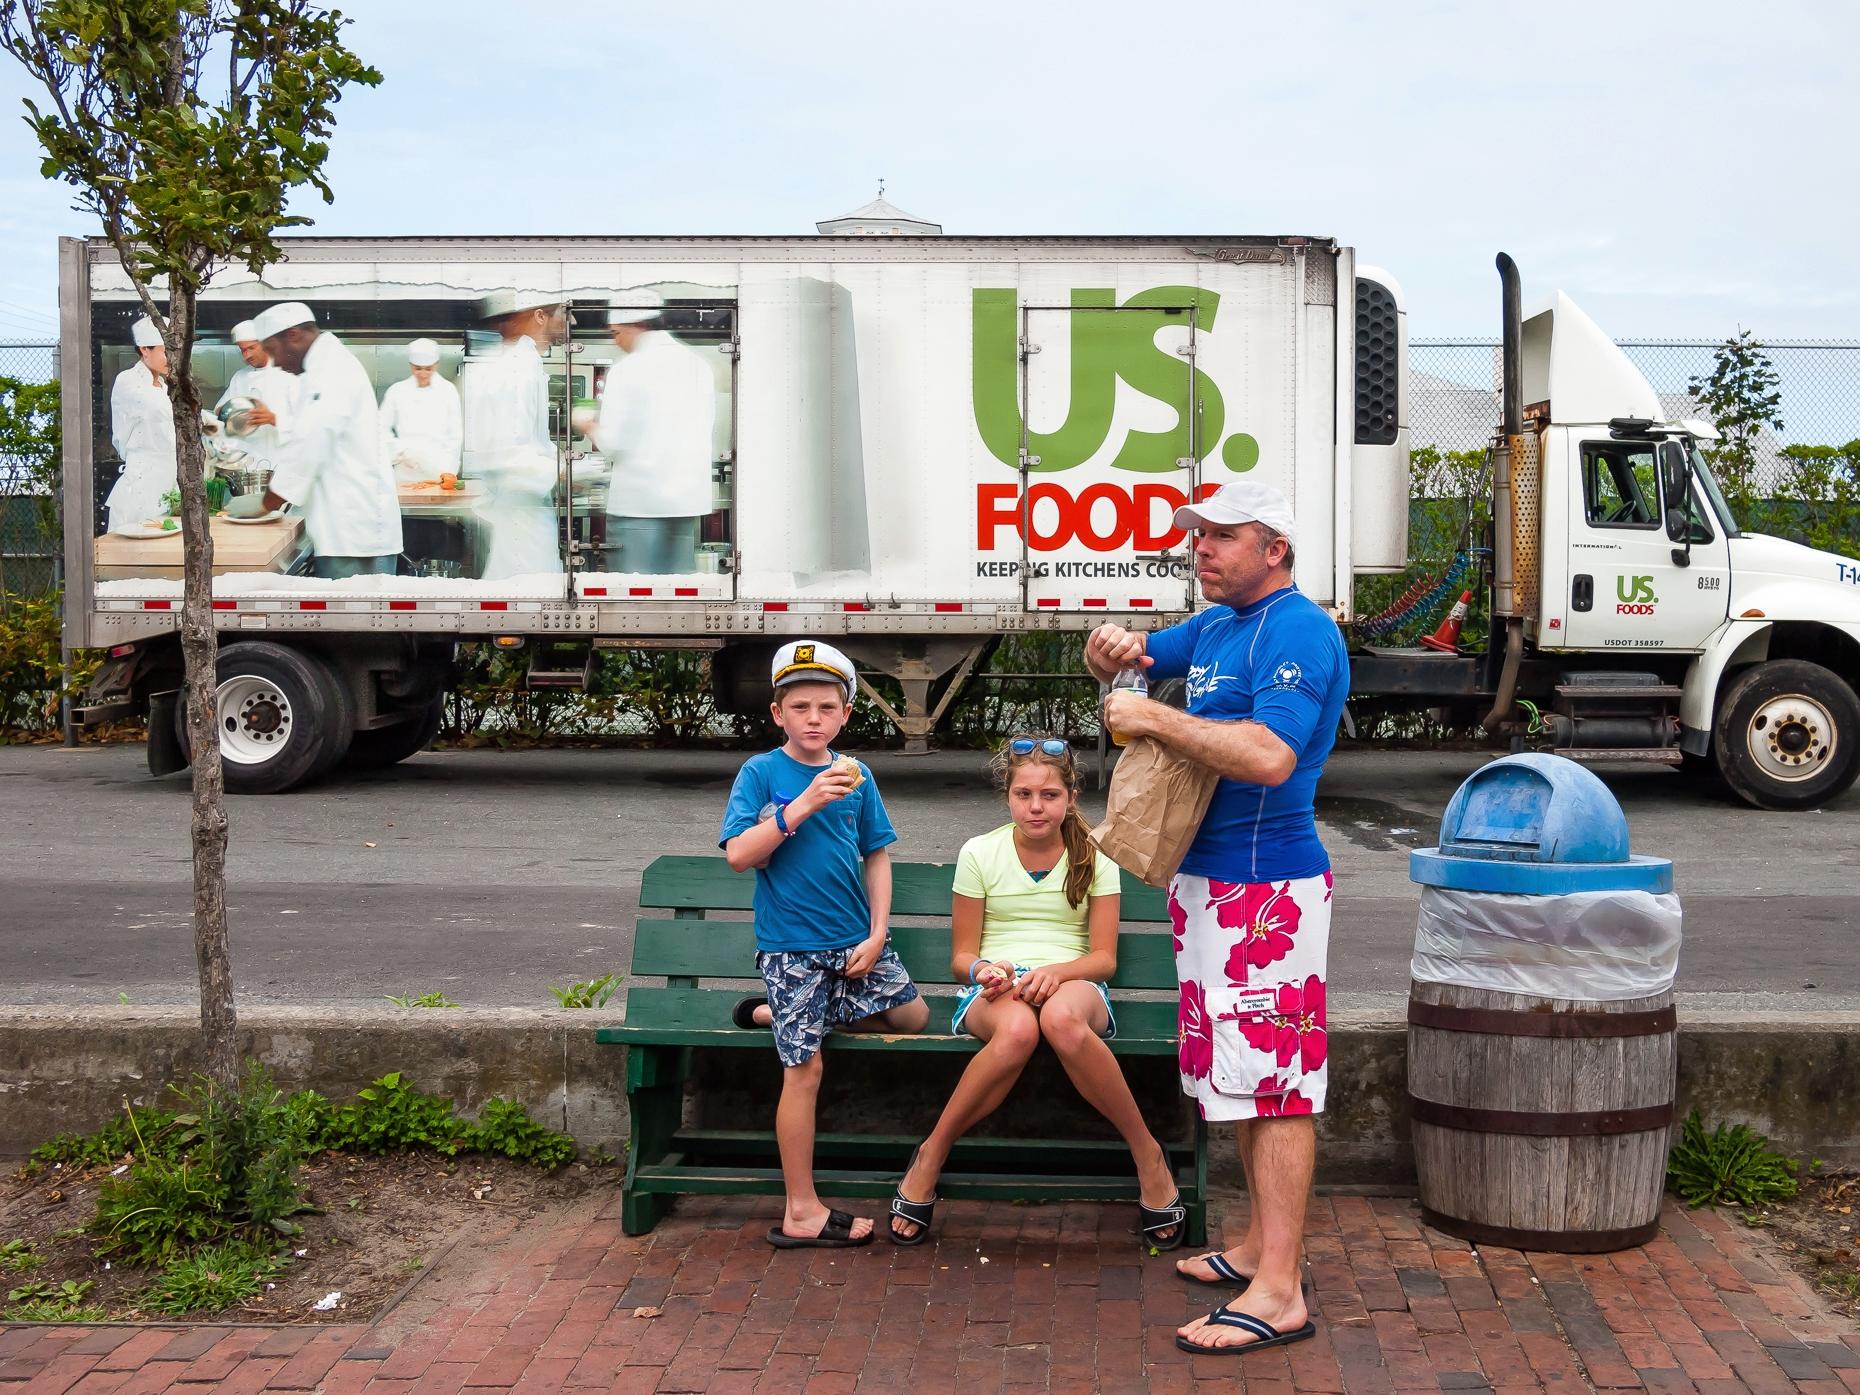 Town, Nantucket, MA, 2013